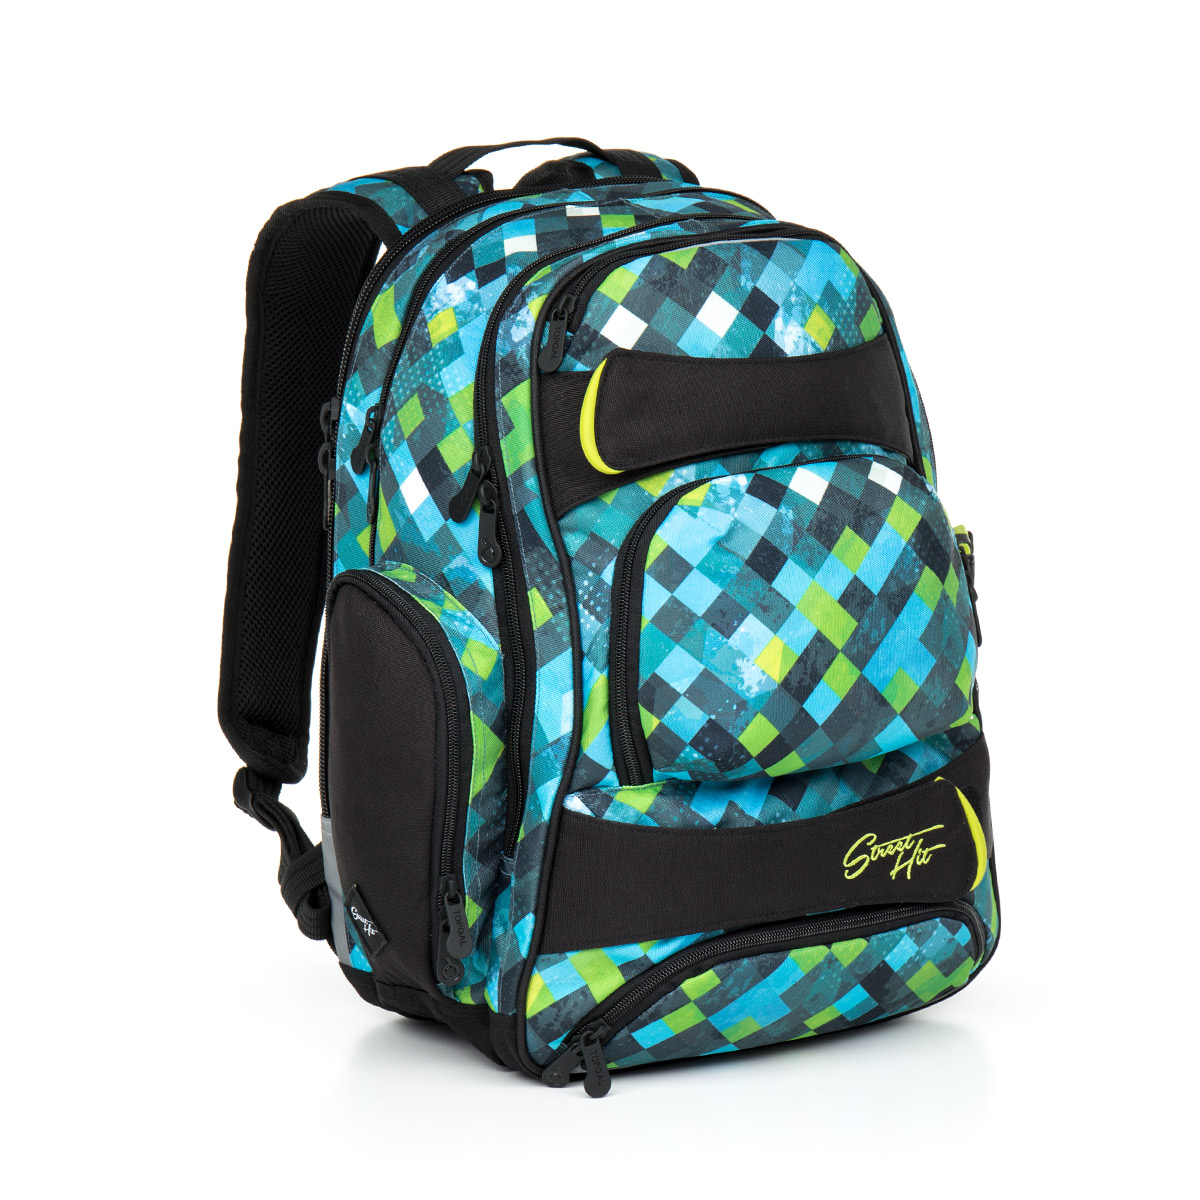 Topgal Studentský batoh HIT 869 E - Green - Glami.cz 8e838d04c0